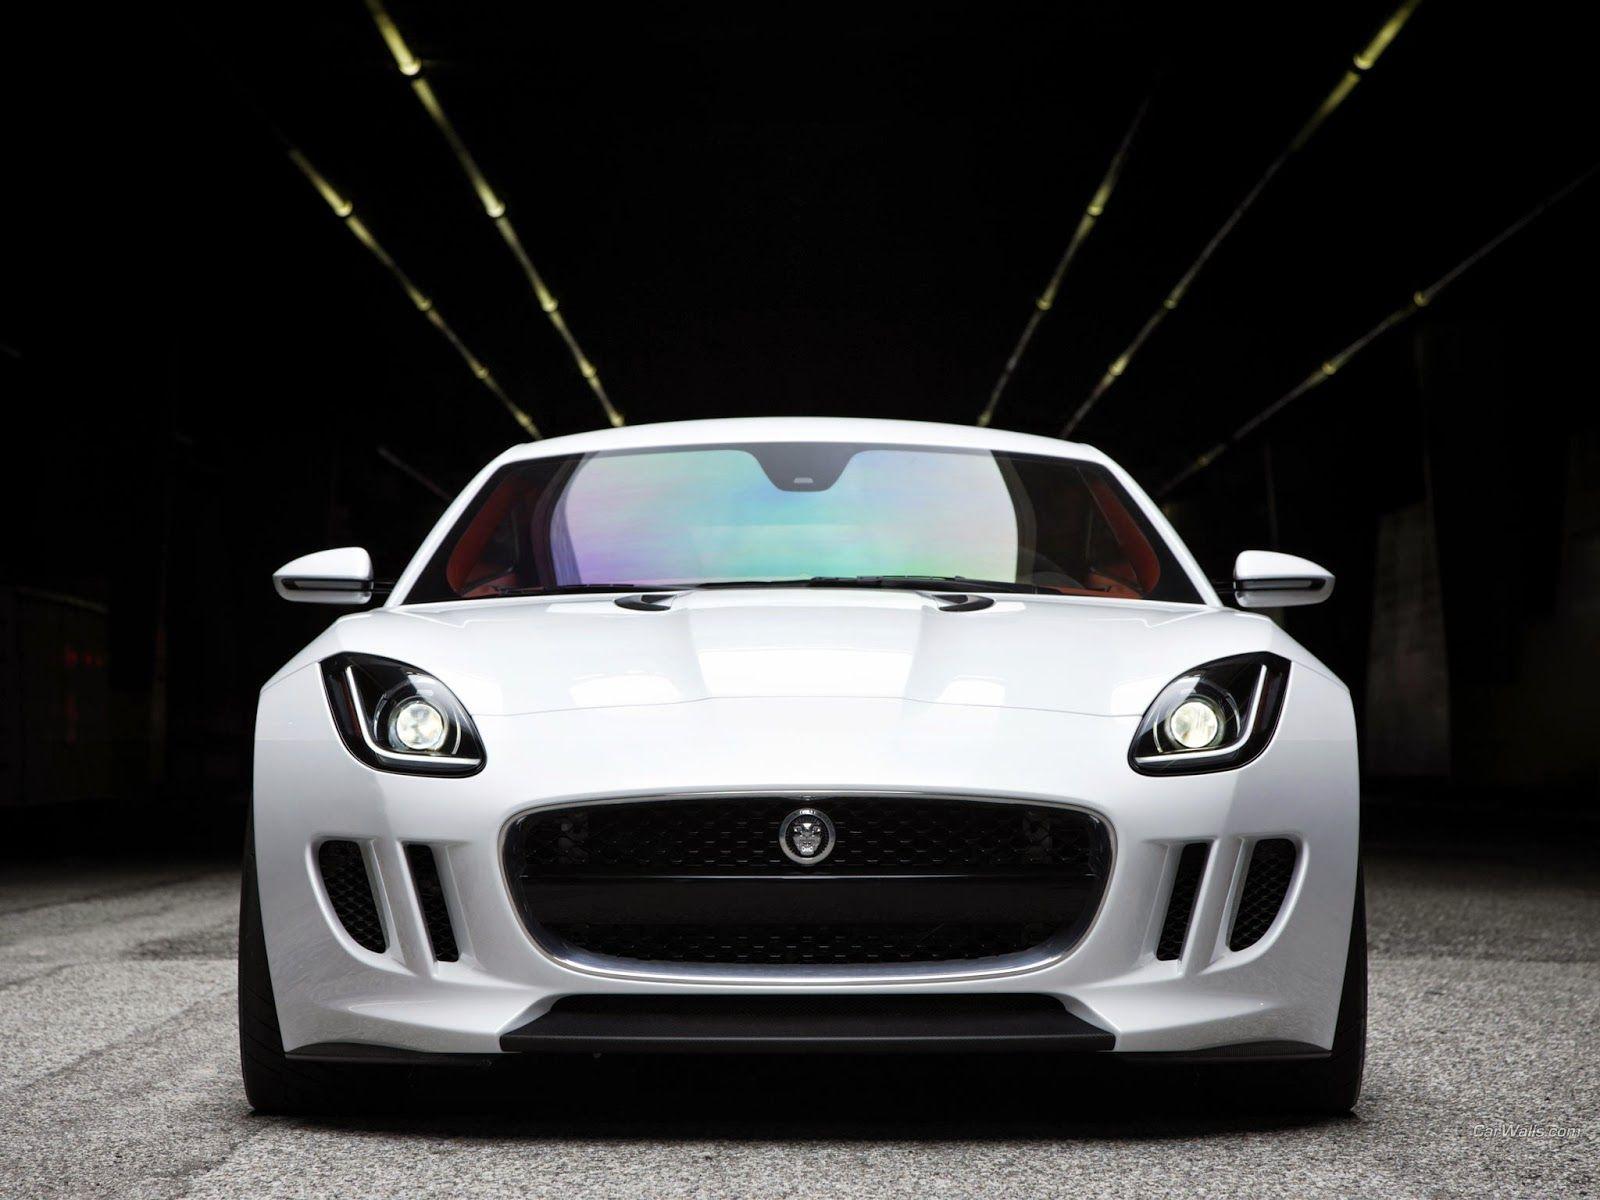 Charmant Jaguar Car Desktop HD(high Defination) Wallpapers   Sri The Creator